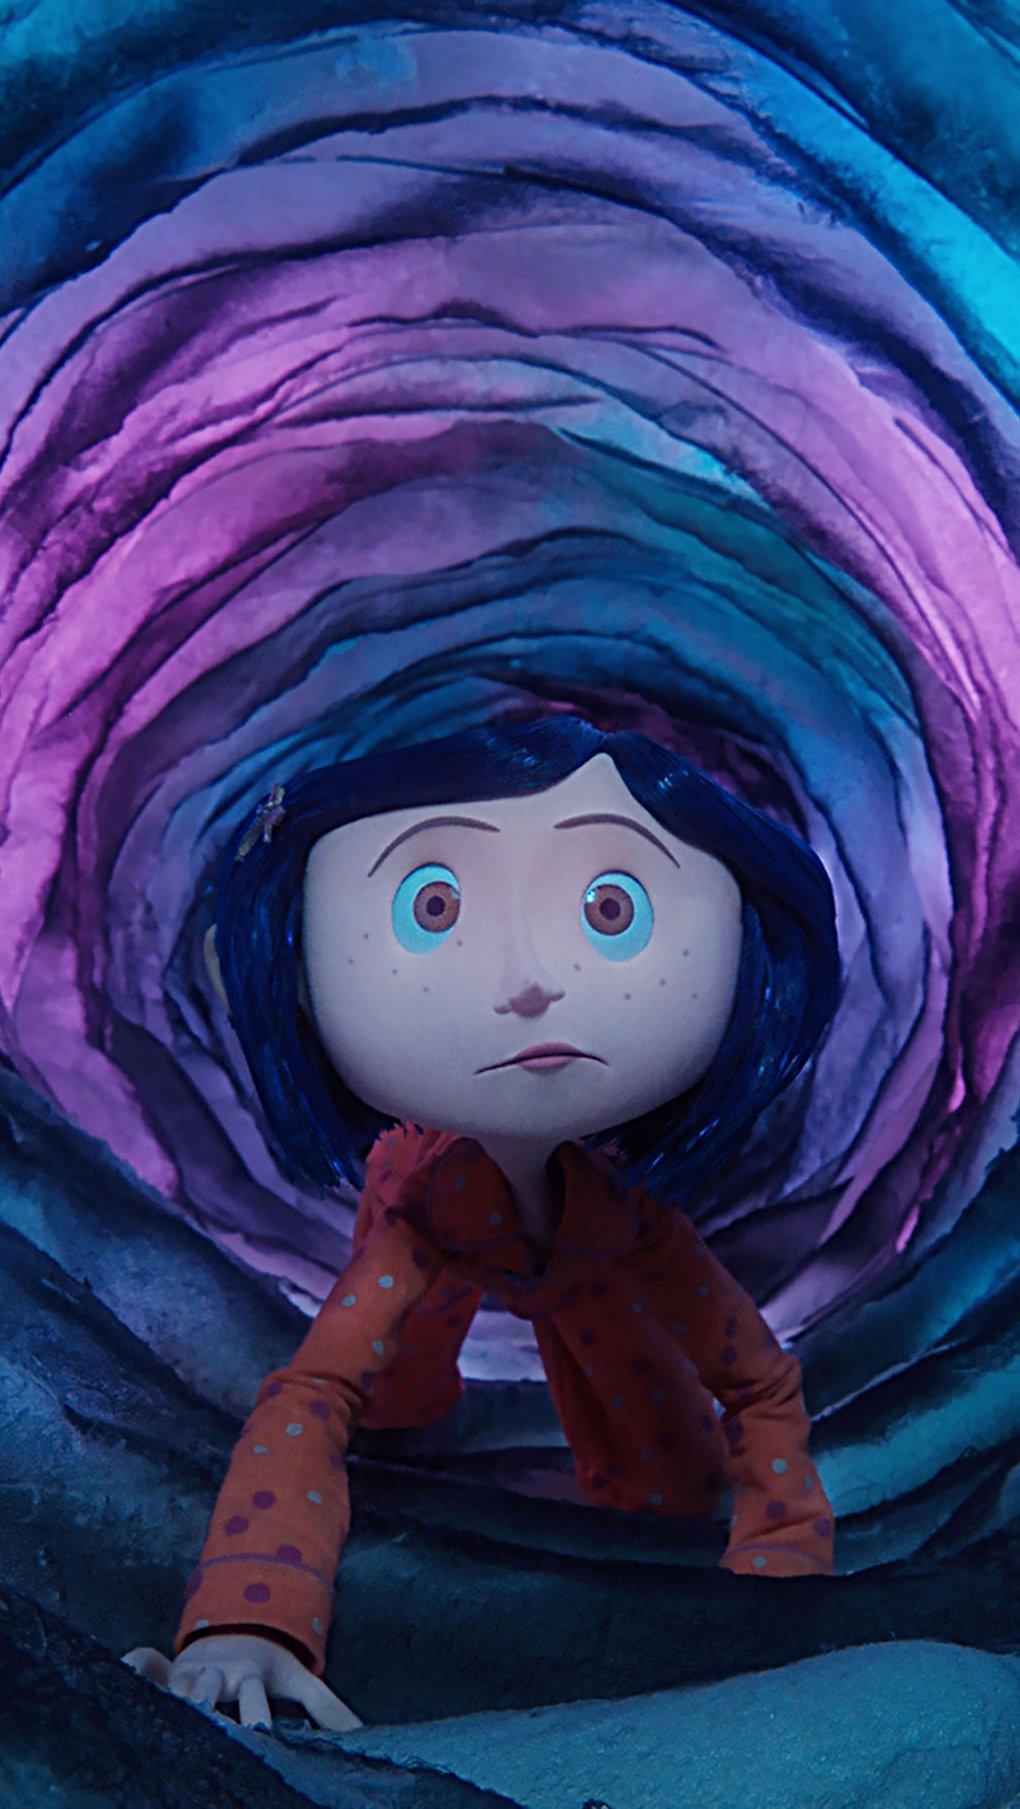 Wallpaper Coraline Movie Vertical